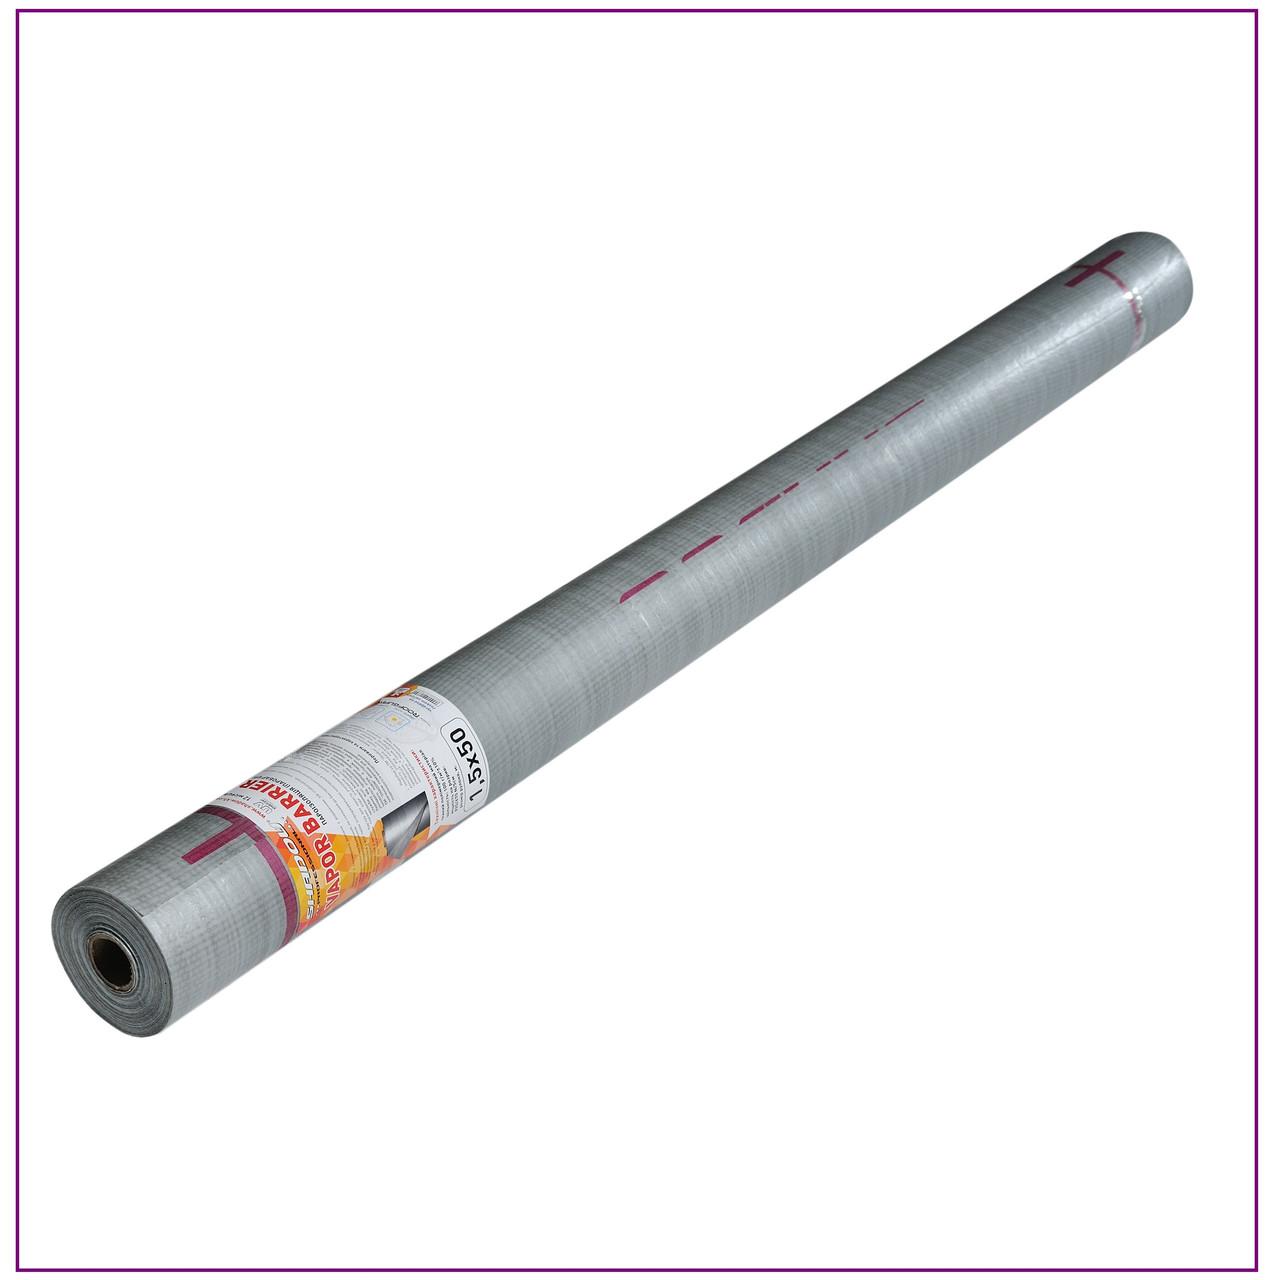 Мембрана пароизоляционная 100 г/м² серебро (1.5*50м) ТМ SHADOW (Чехия)